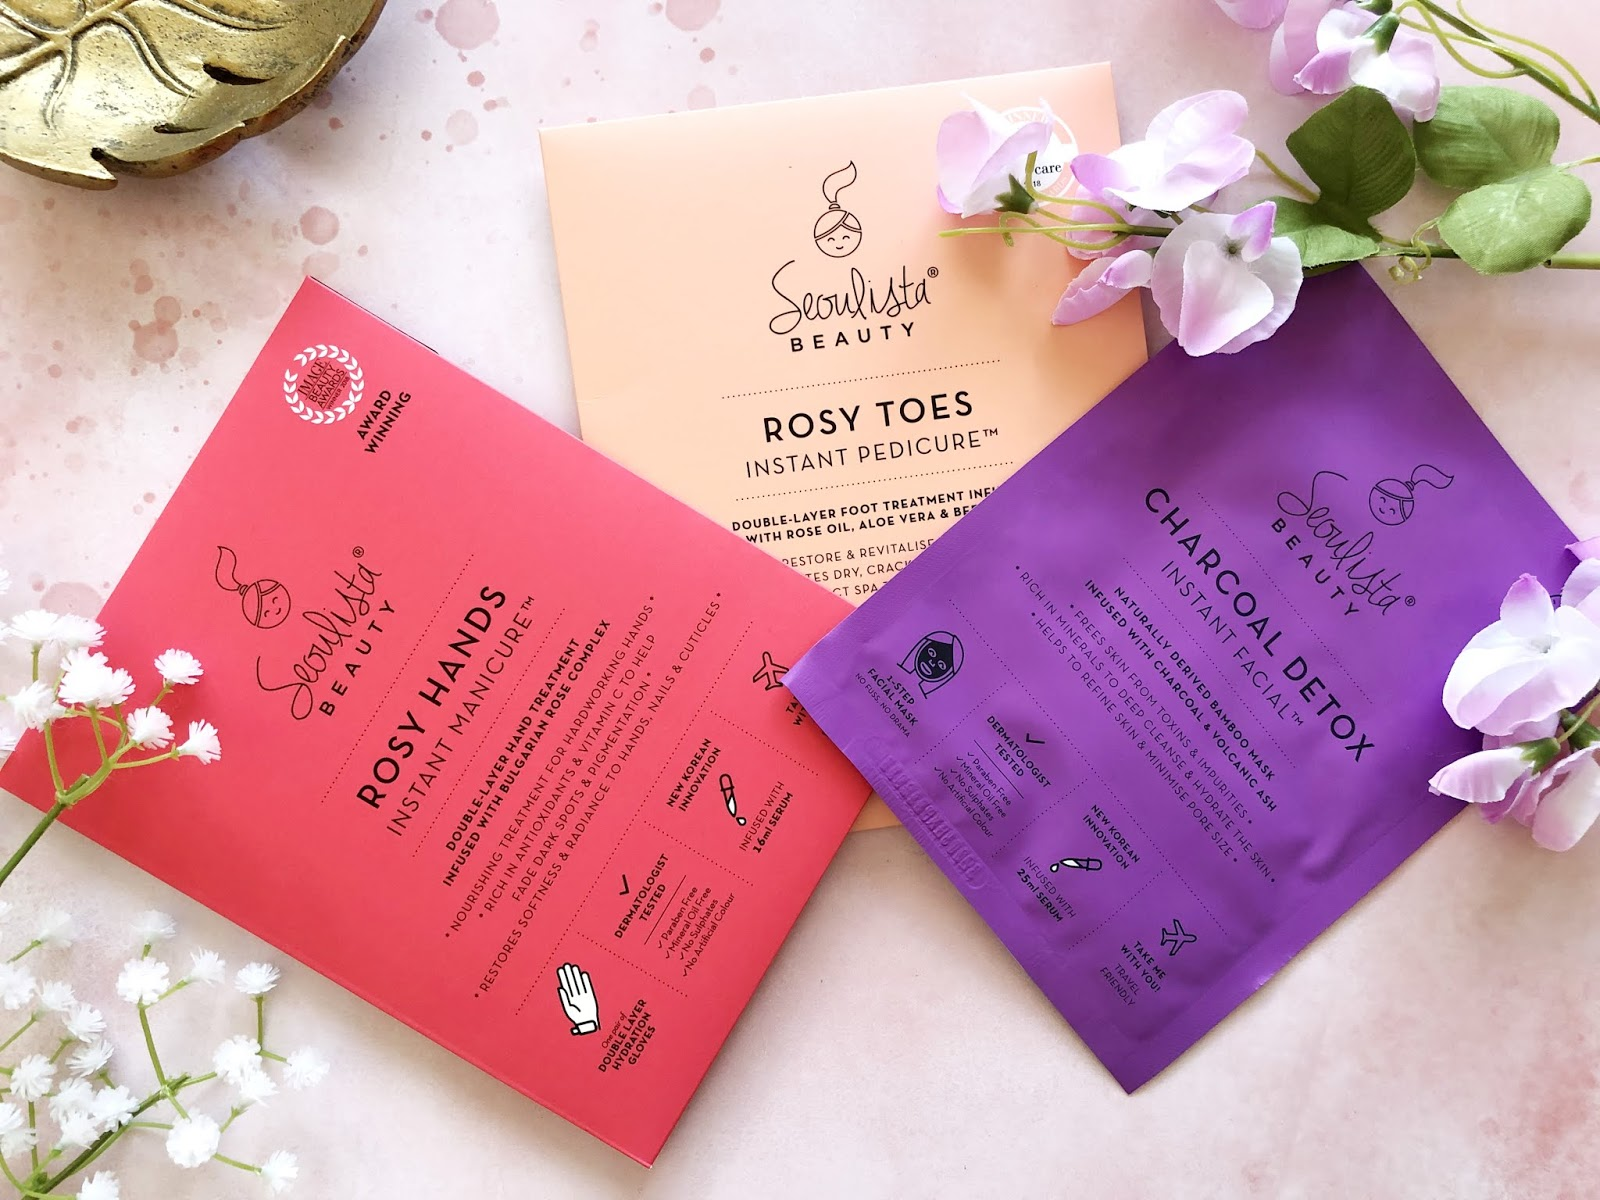 Seoulista Beauty Detoxified and Amplified Head-to-Toe Glow Box